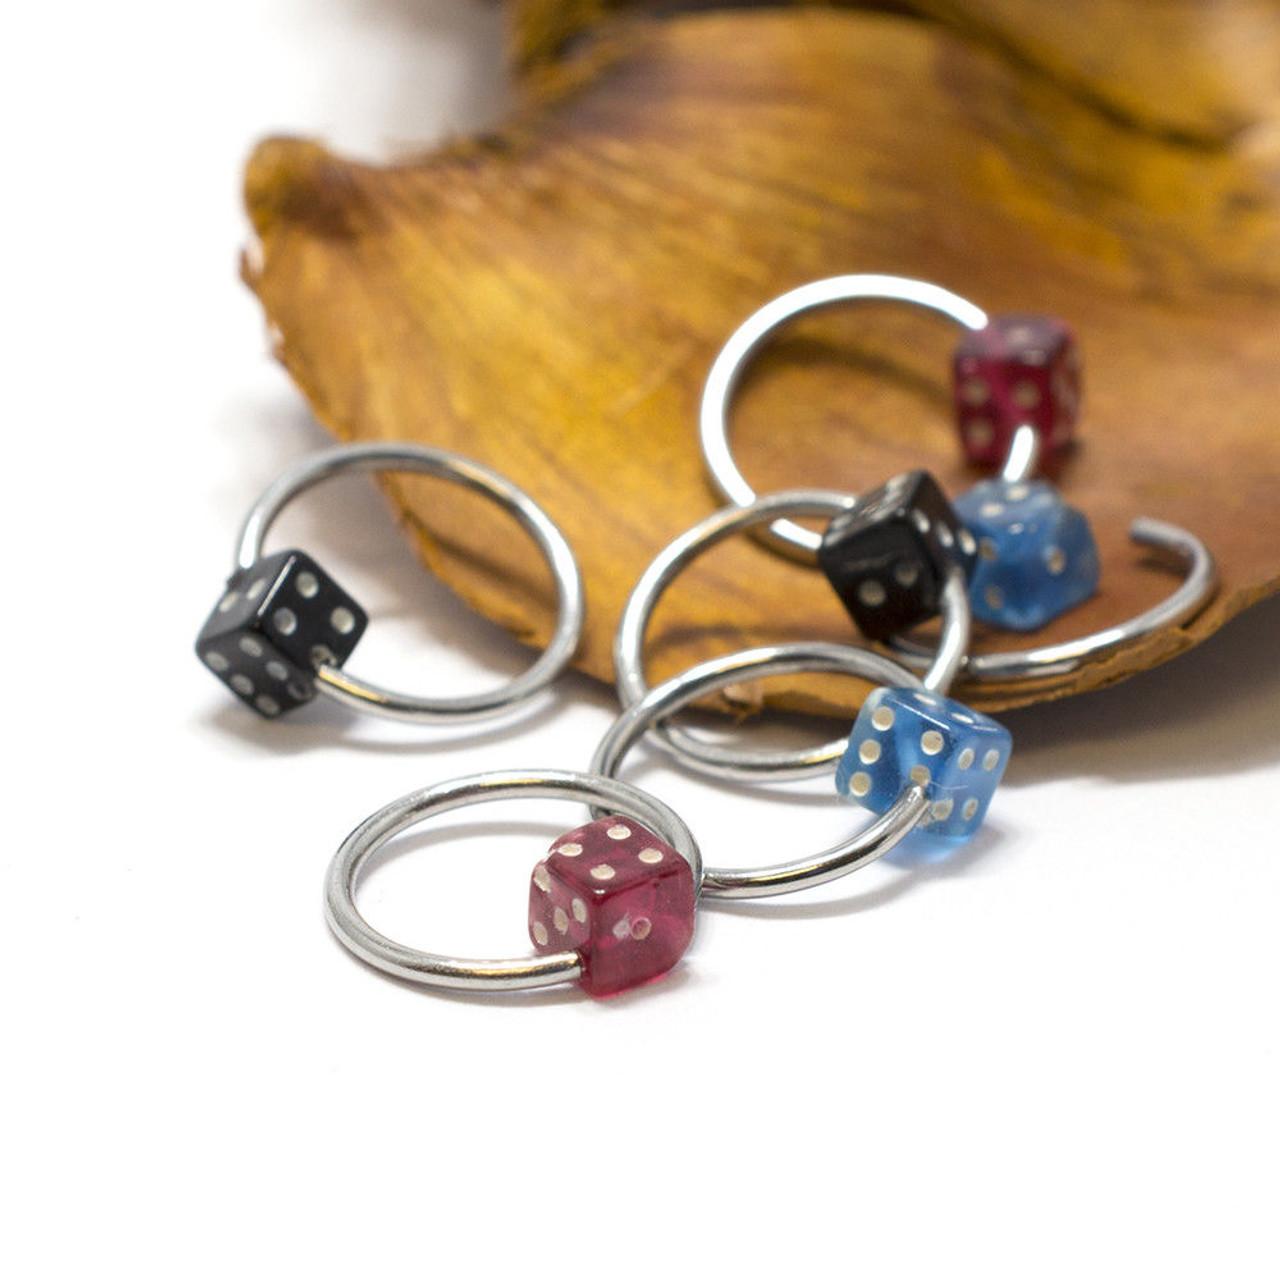 Nipple Ring Septum 6pc Captive Bead Ring Acrylic Dice 18G Surgical Steel Jewelry